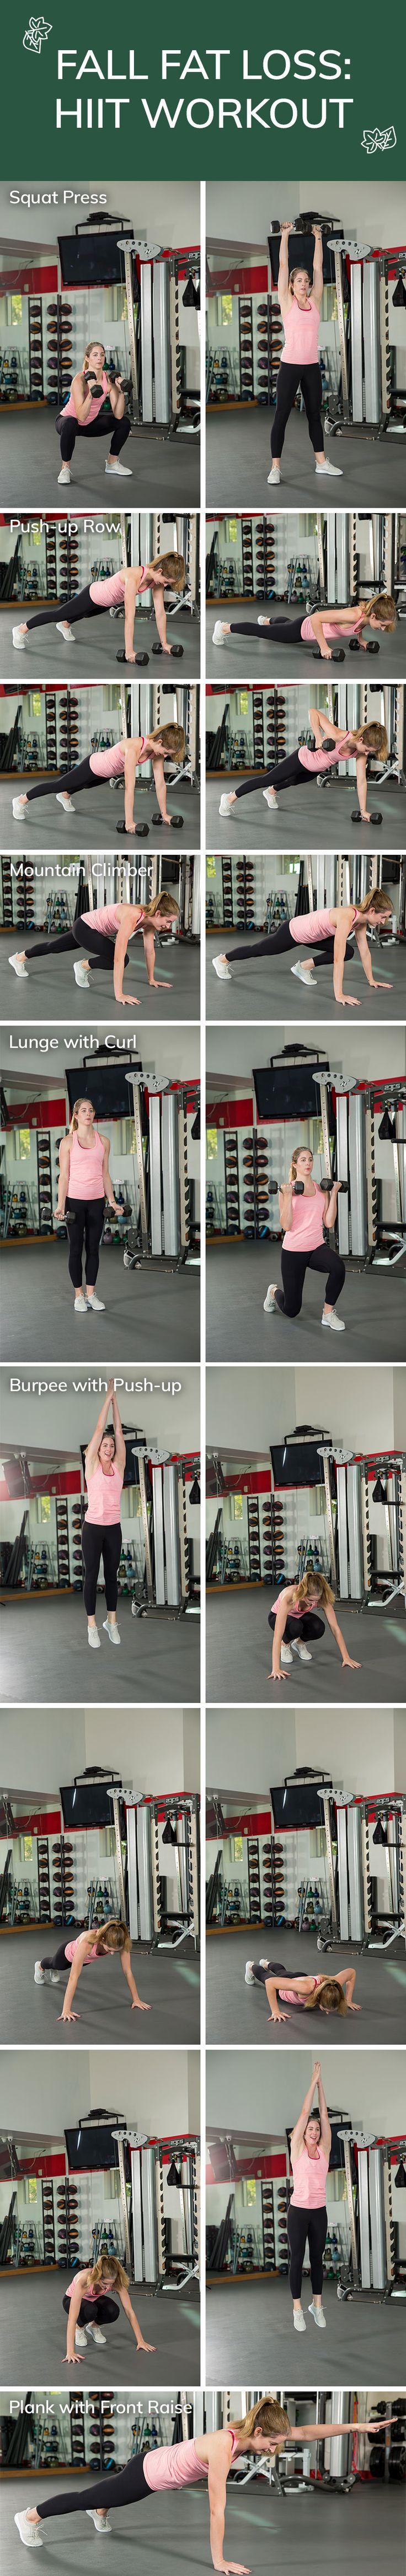 Fall Fat Loss: HIIT Workout